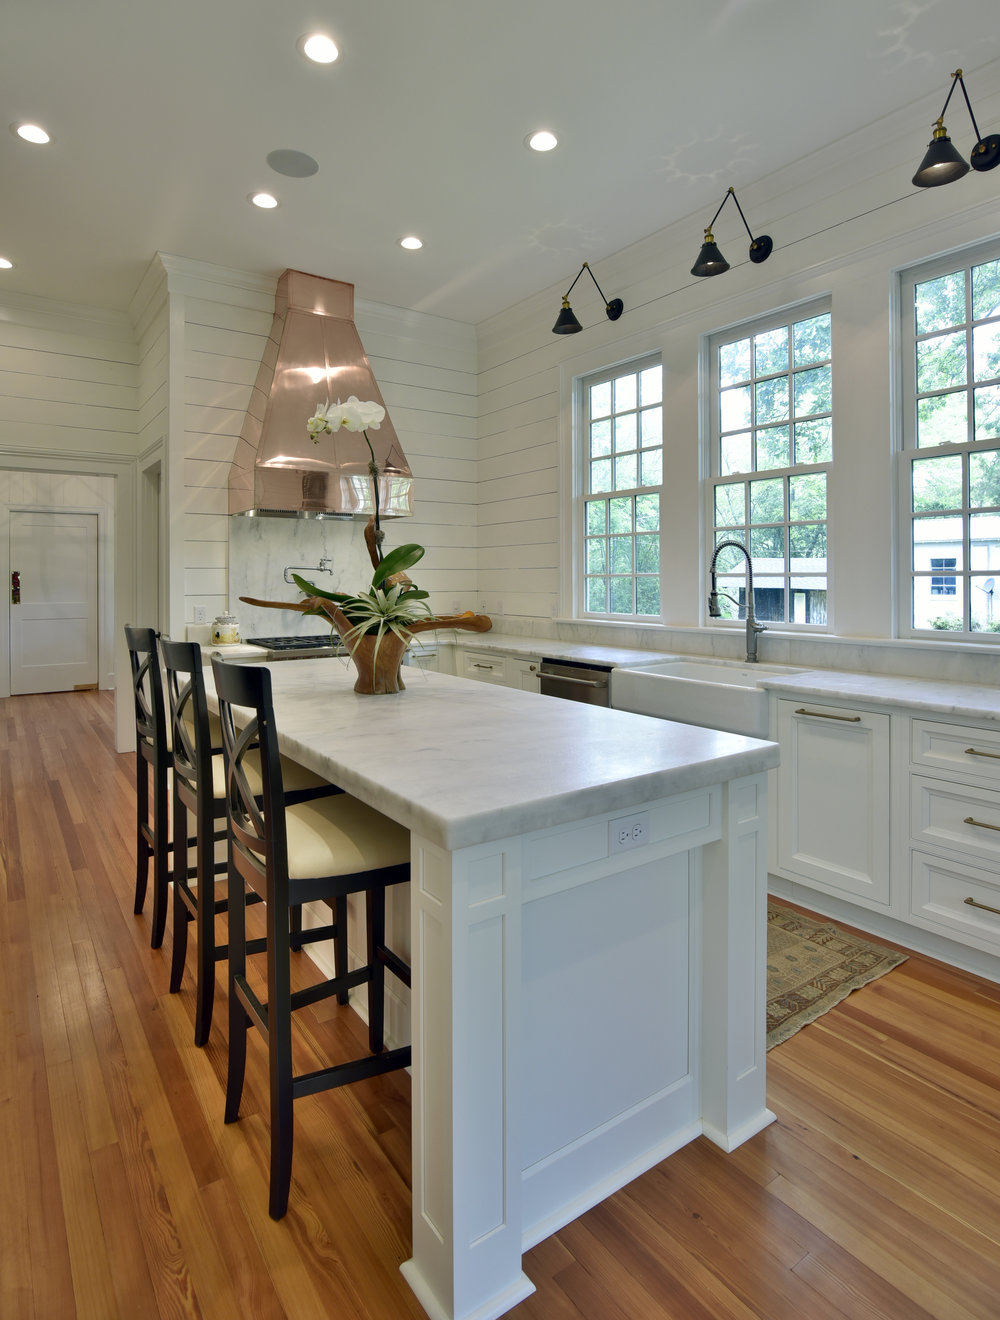 Return To Kitchen Remodel Gallery